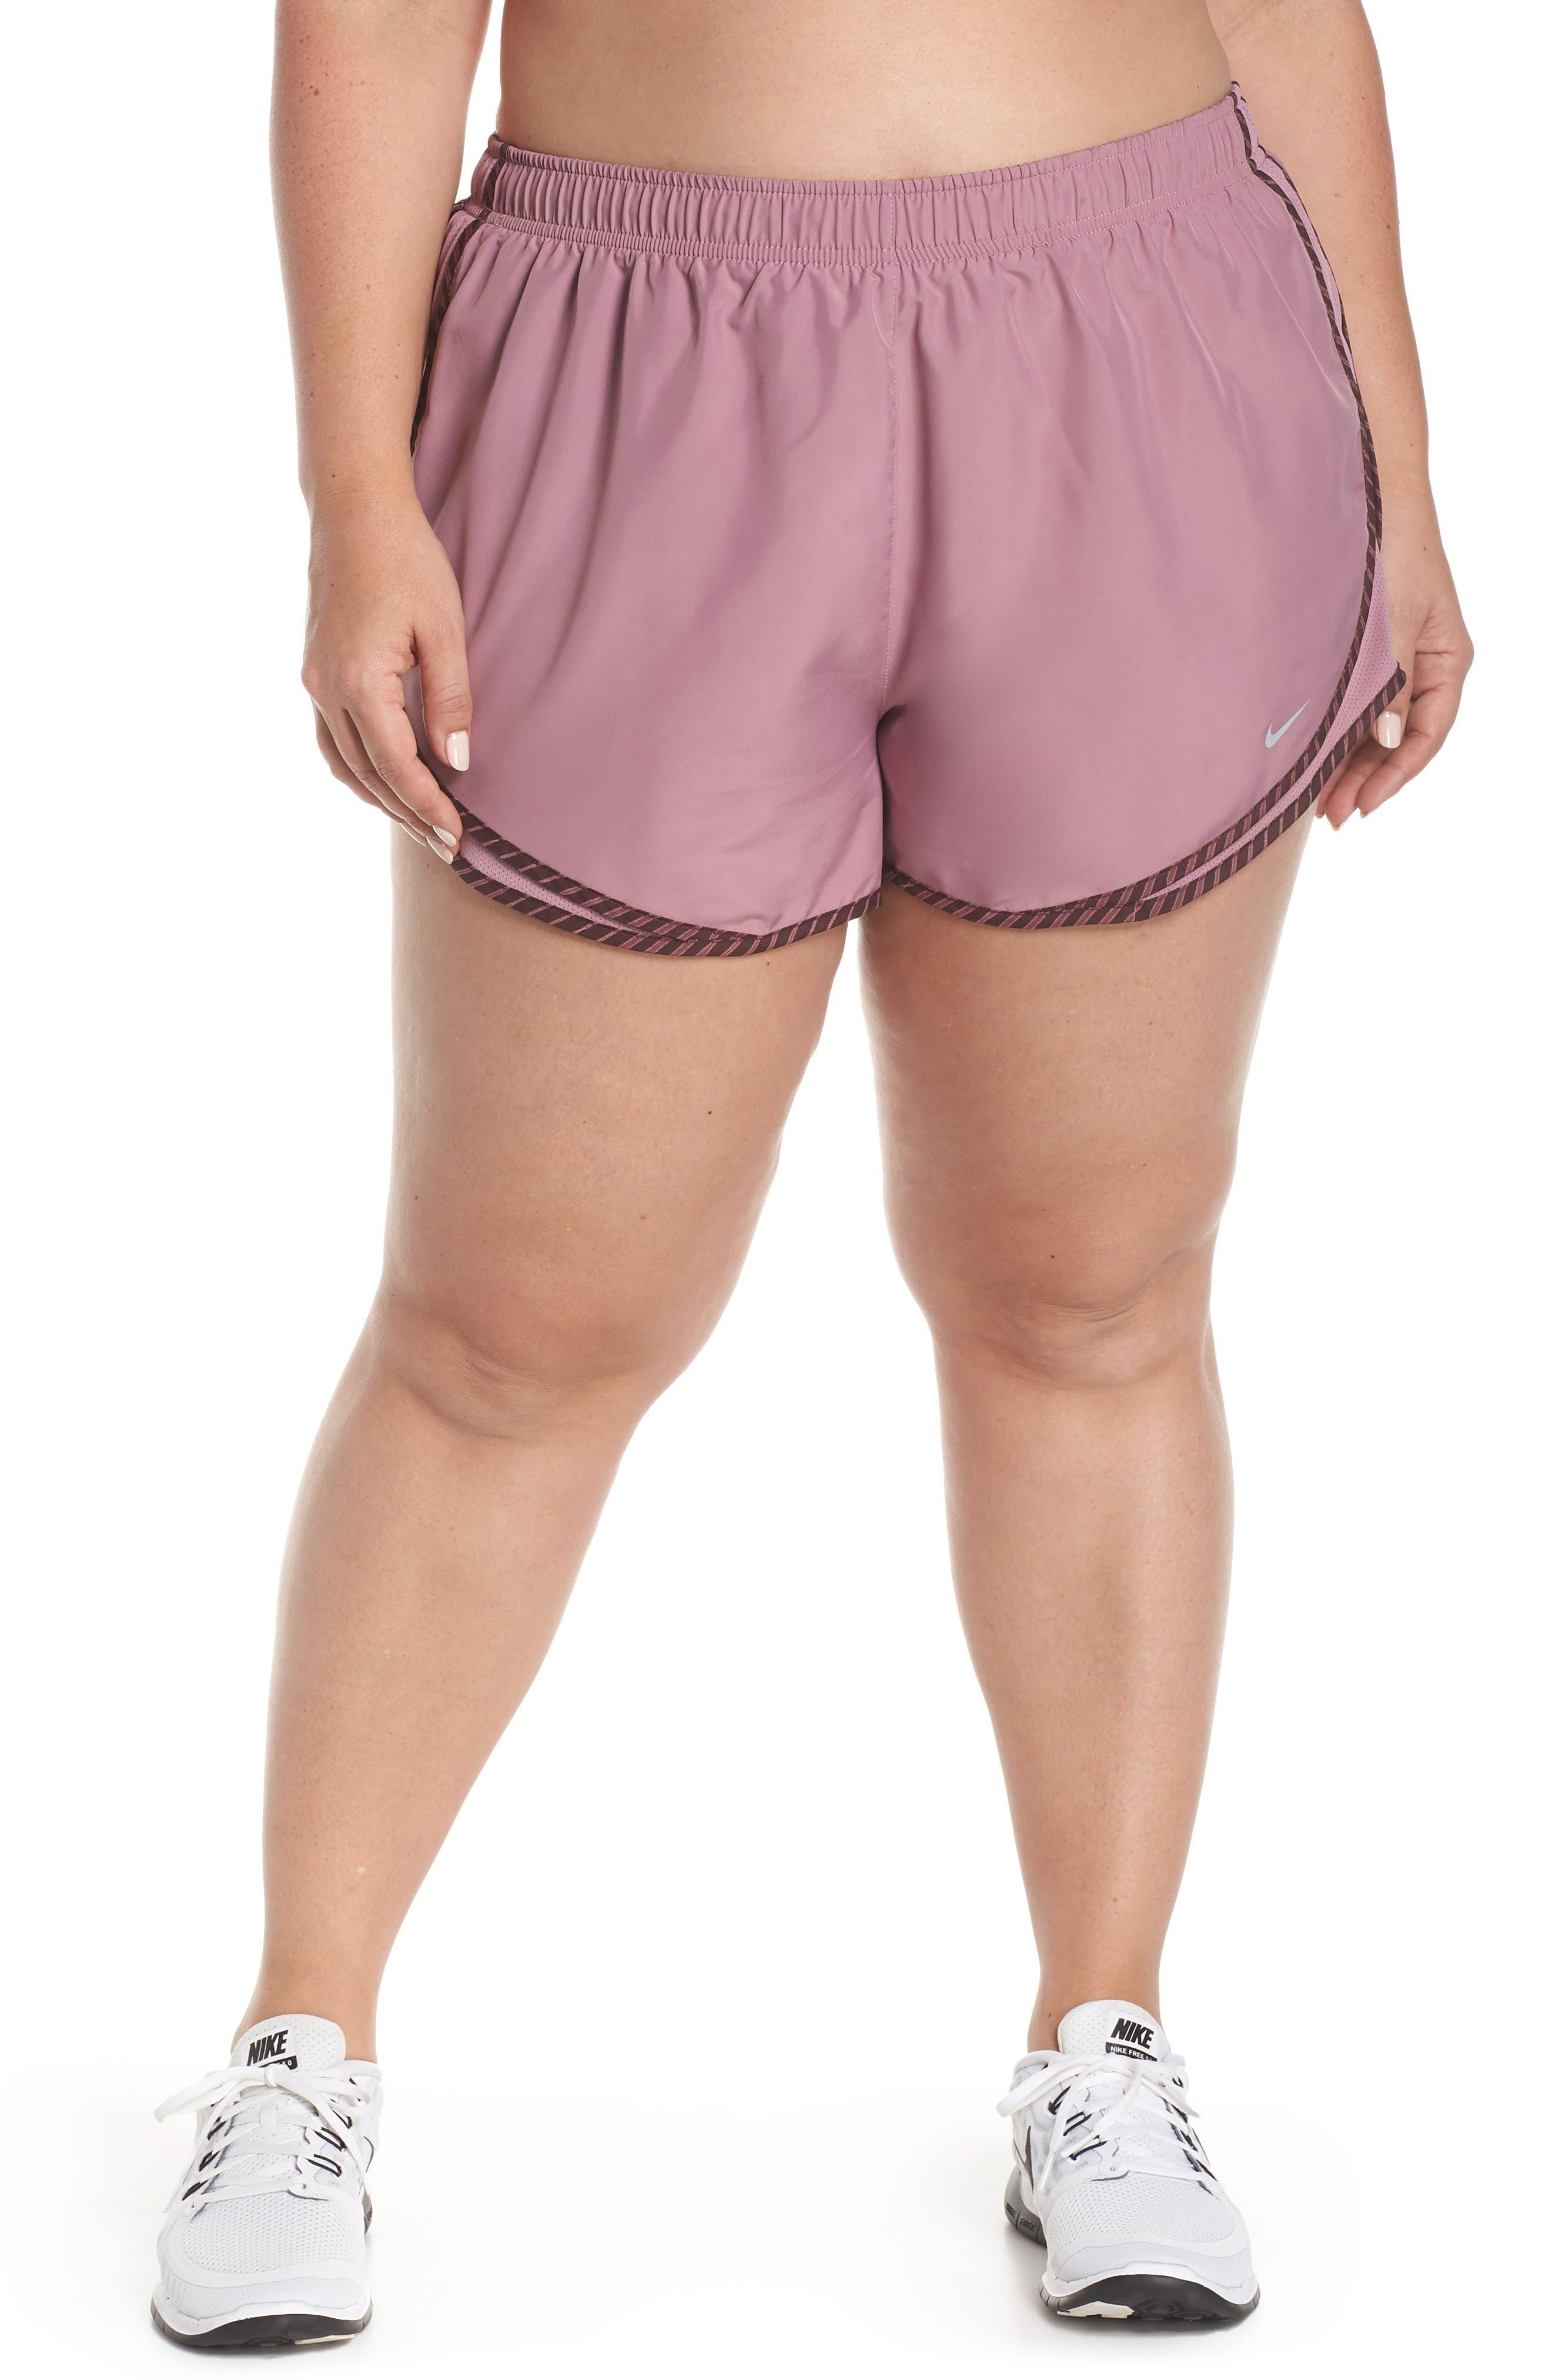 NIKE, Dry Tempo High Rise Running Shorts, Main thumbnail 1, color, PLUM/ EL DORADO/ WOLF GREY